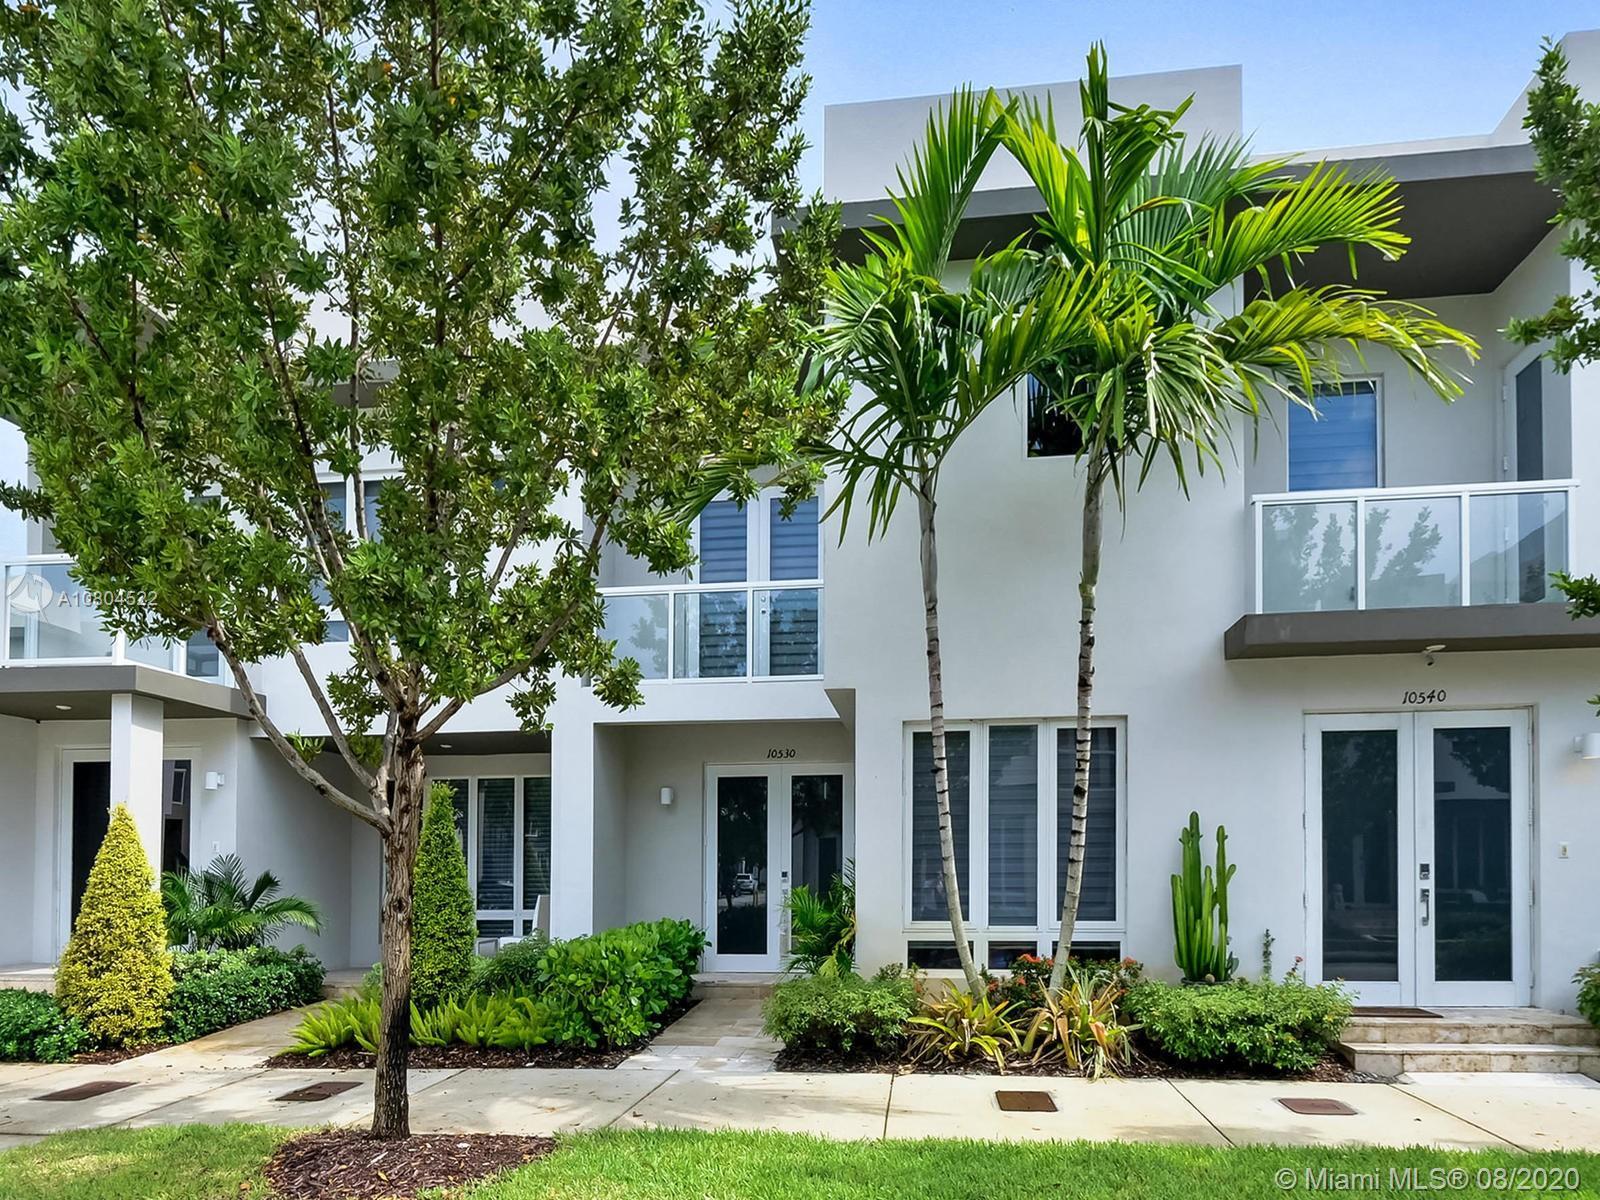 10530 NW 63rd Terrace - Doral, Florida